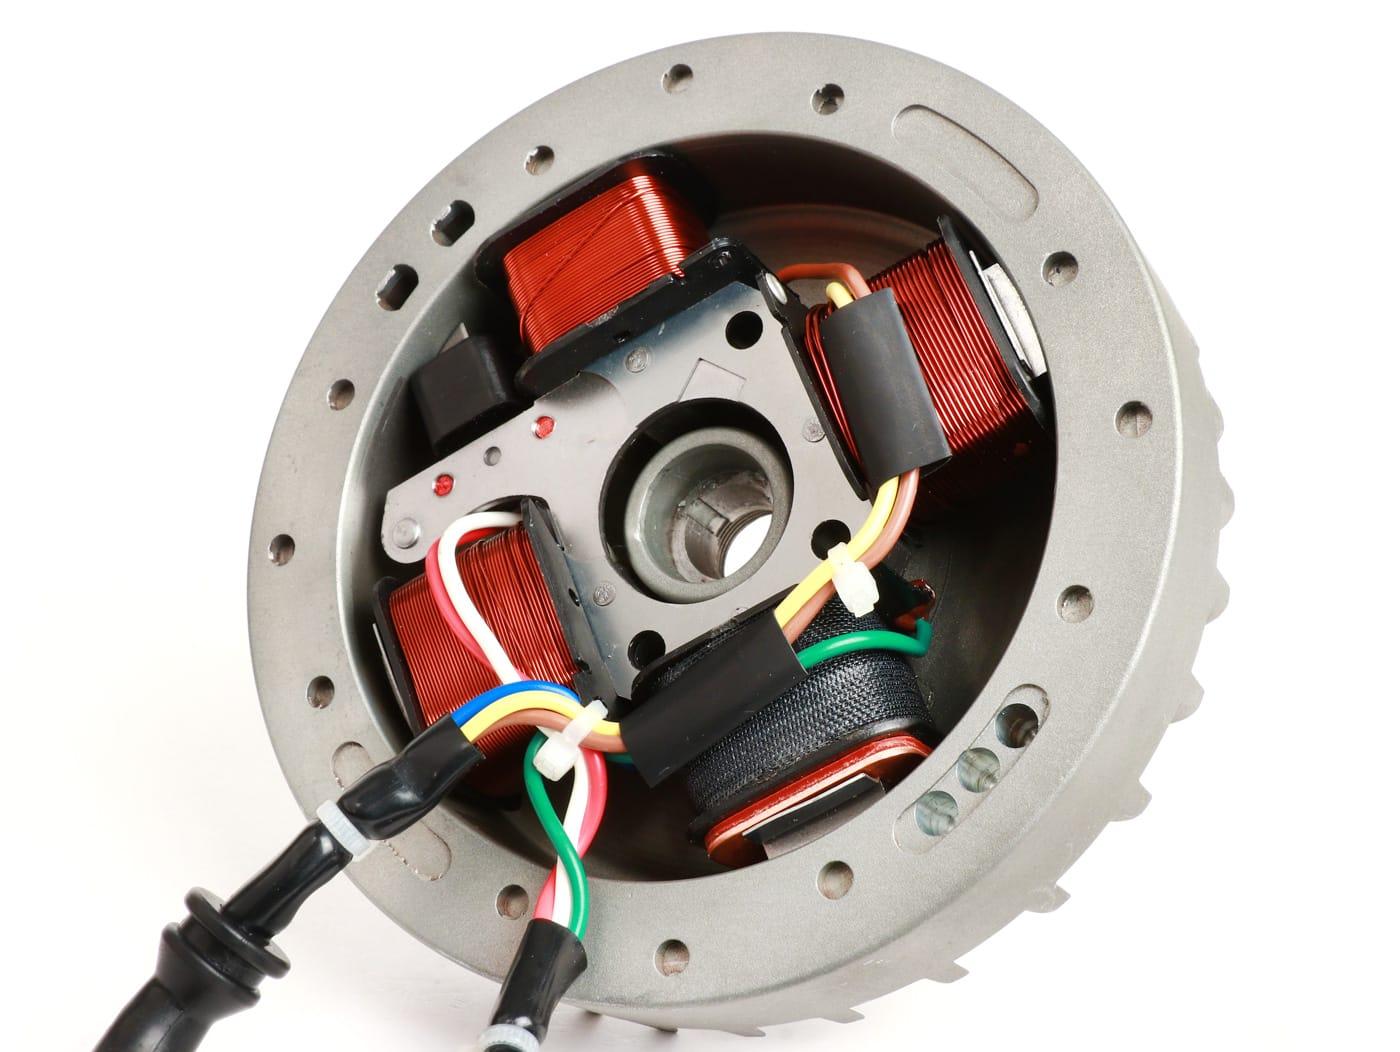 Zündung-Set -BGM Pro elektronisch- Vespa Ciao, SI - verwendbar mit Motorgehäuse Polini oder Malossibgm Pro Artikel-Nr.: BGM6666